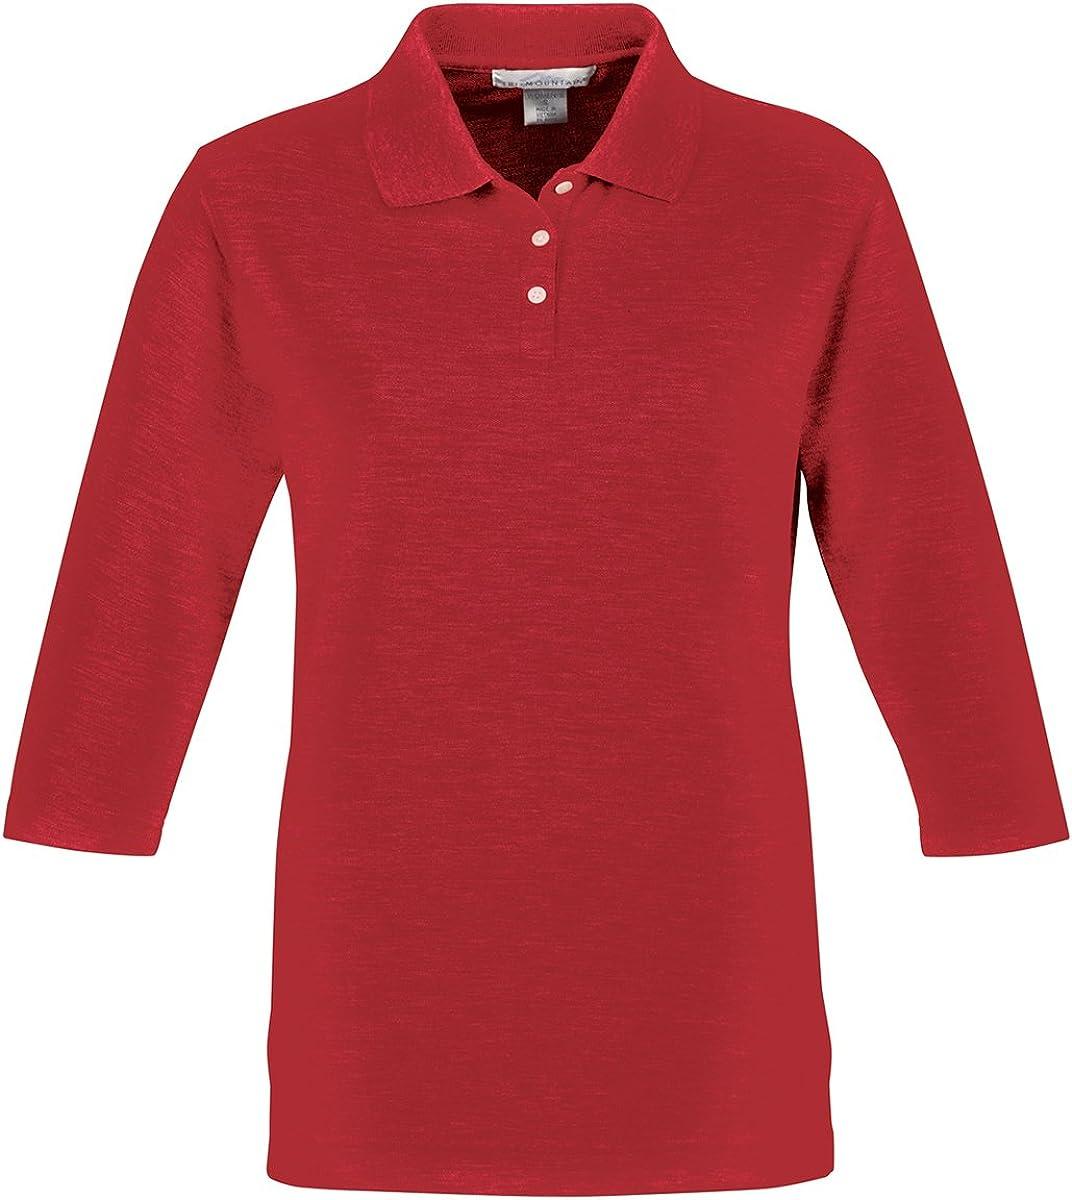 Tri Mountain Women's 3/4-Sleeve Pique Knit Golf Shirt